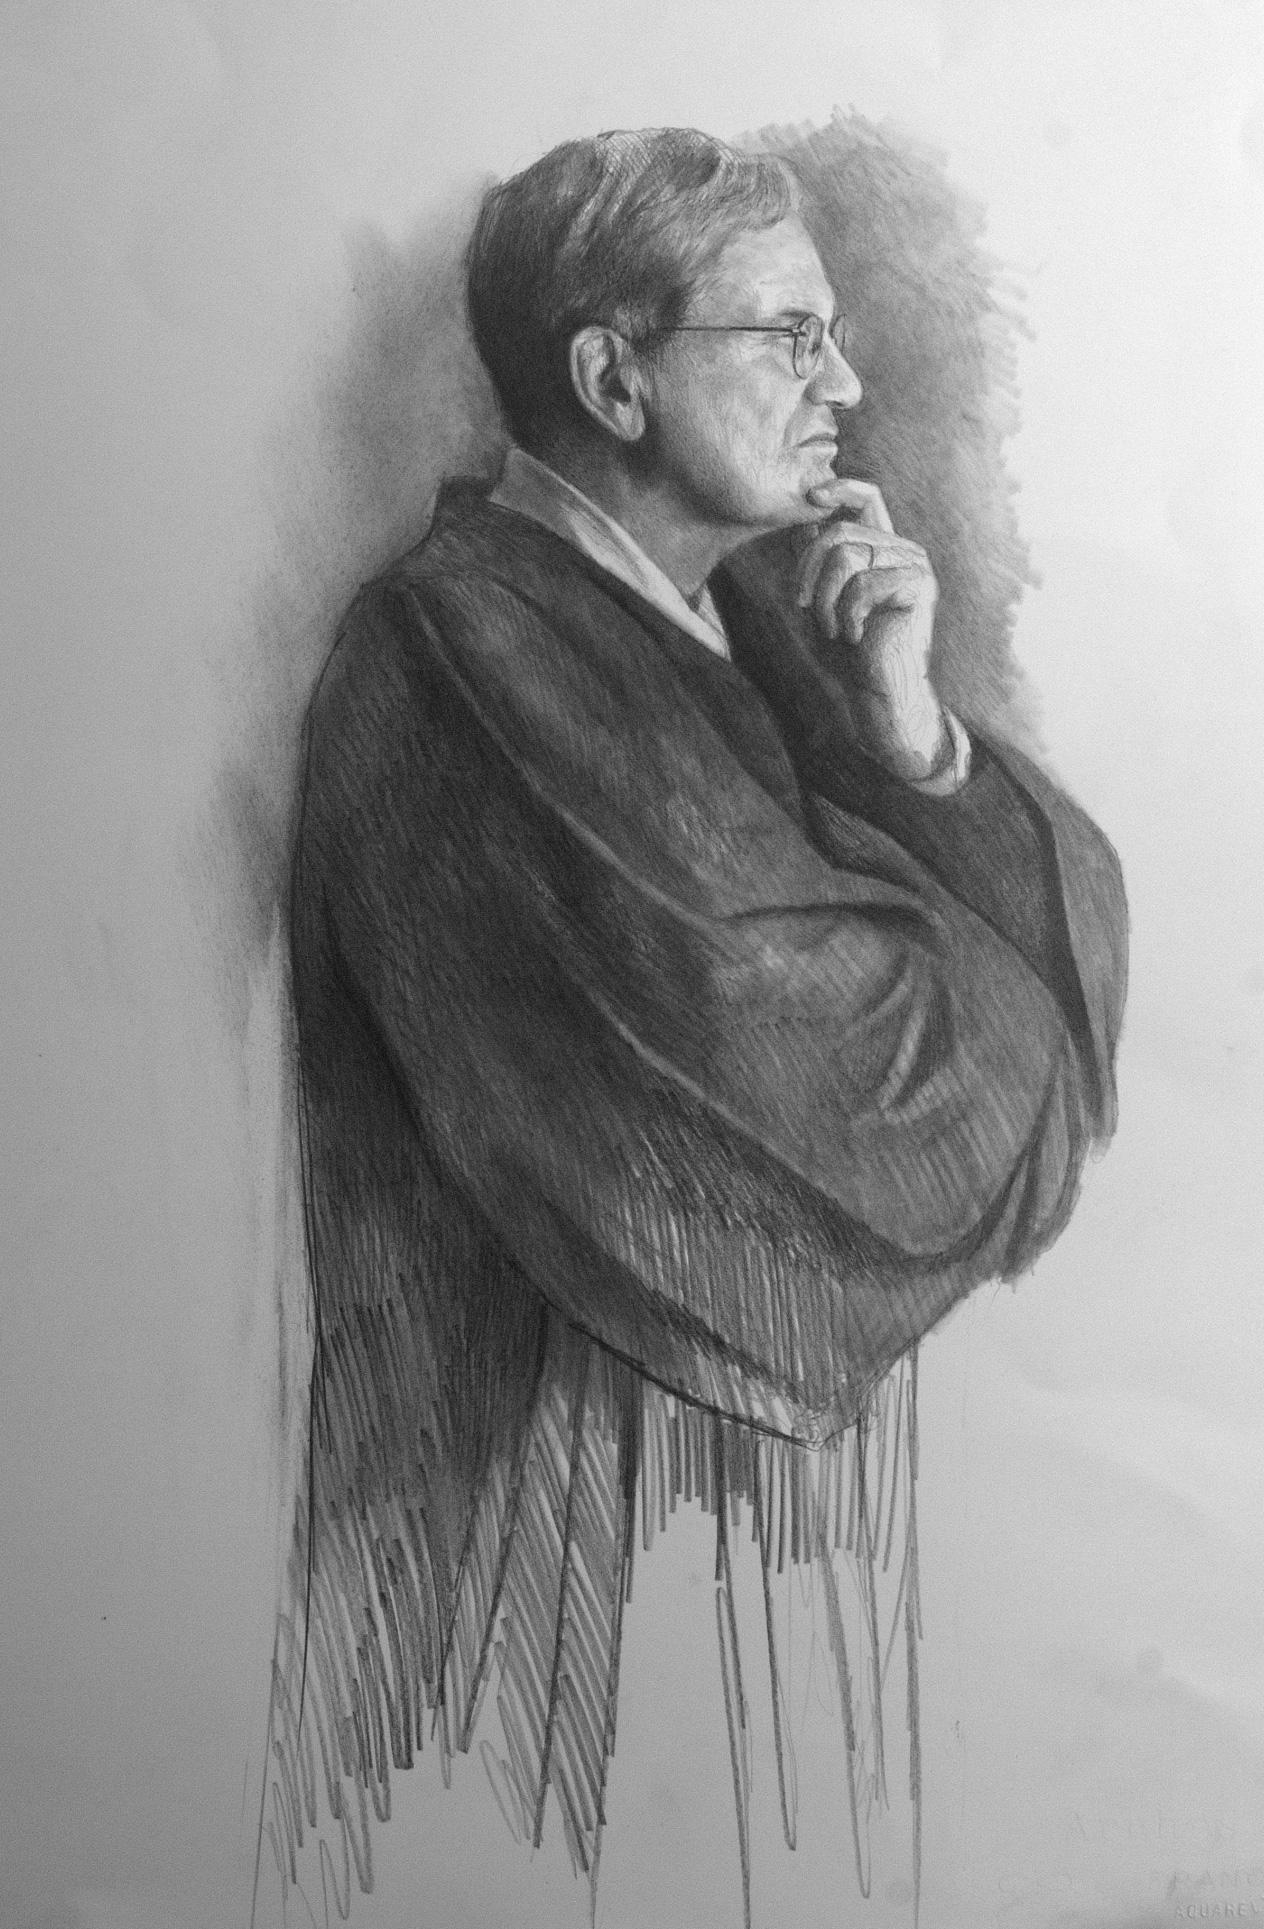 Jose Cabranes, Appelate Judge